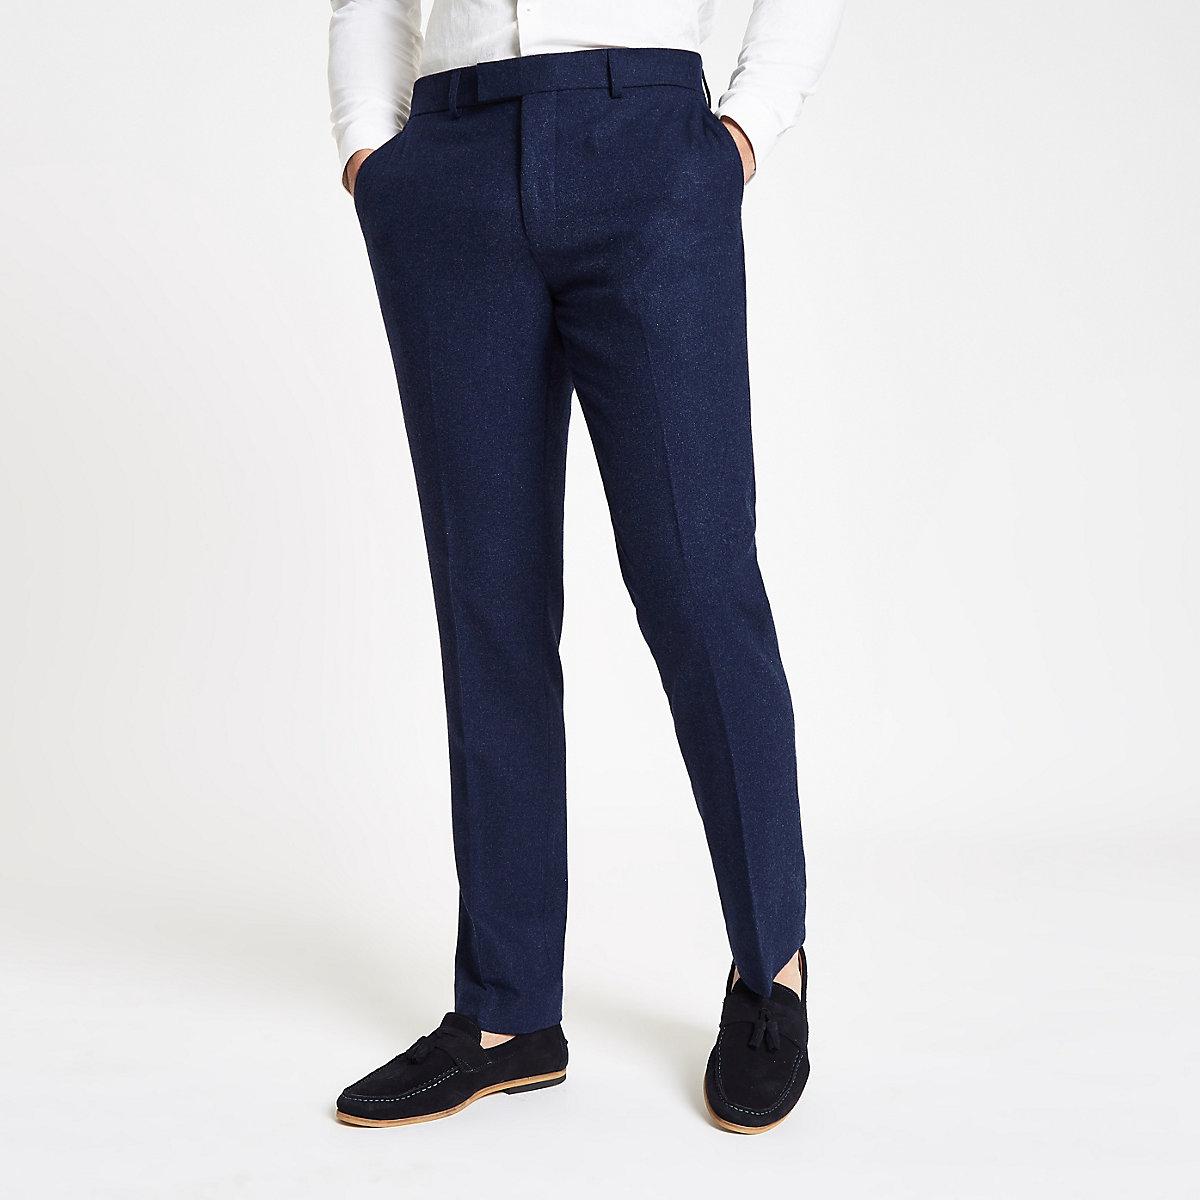 Farah blue wool skinny suit trousers